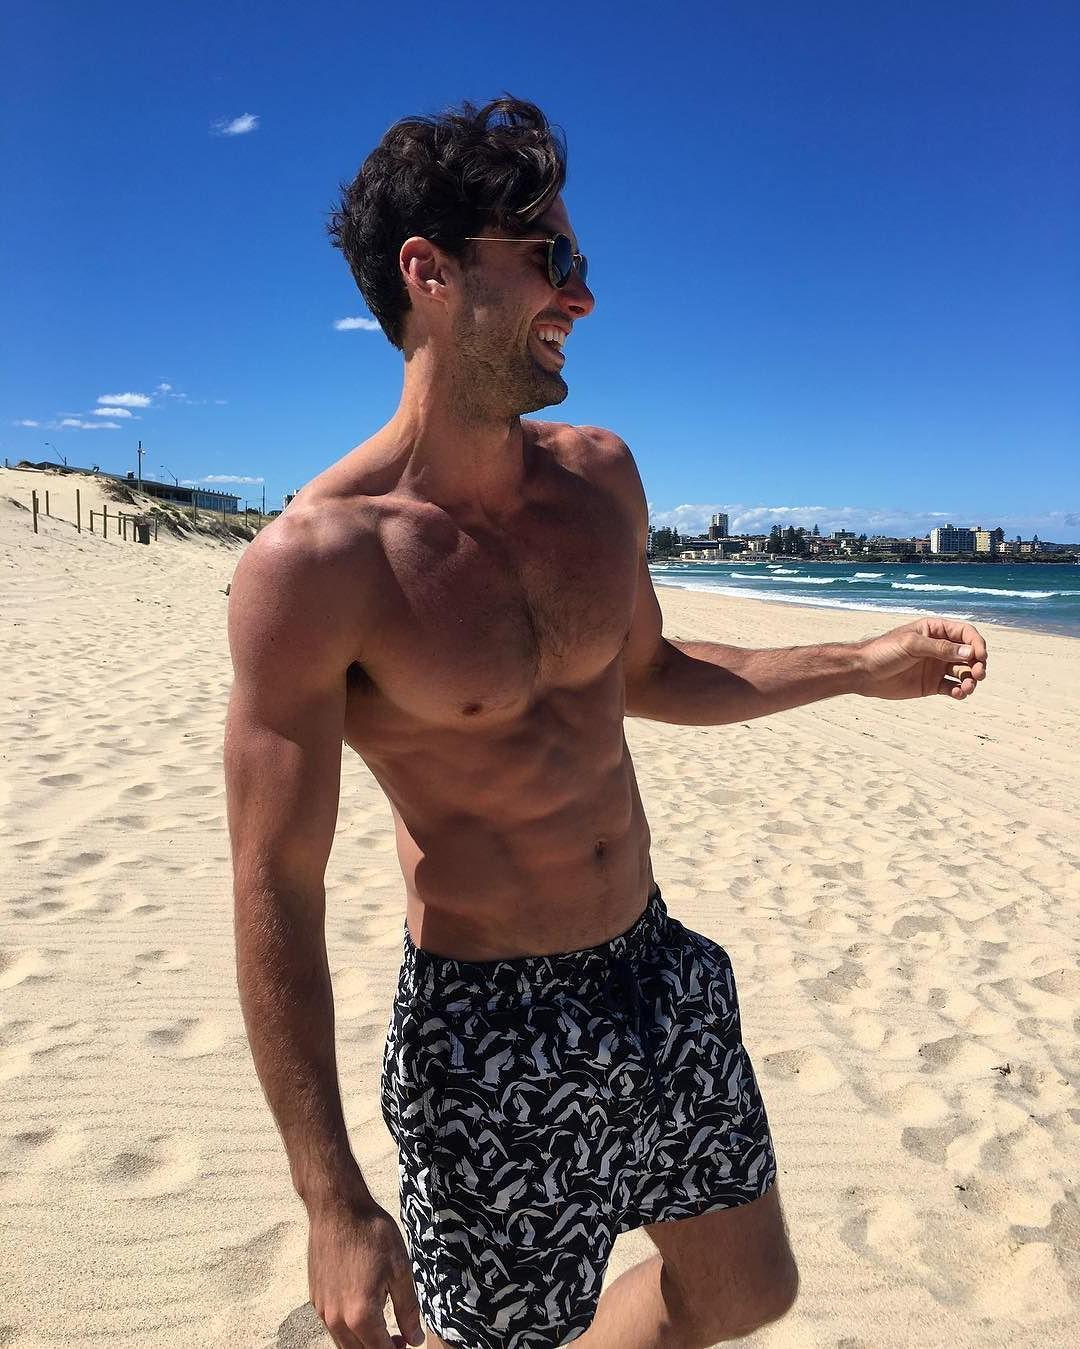 cute-hairy-barechest-gay-bottom-guy-smiling-beach-babe